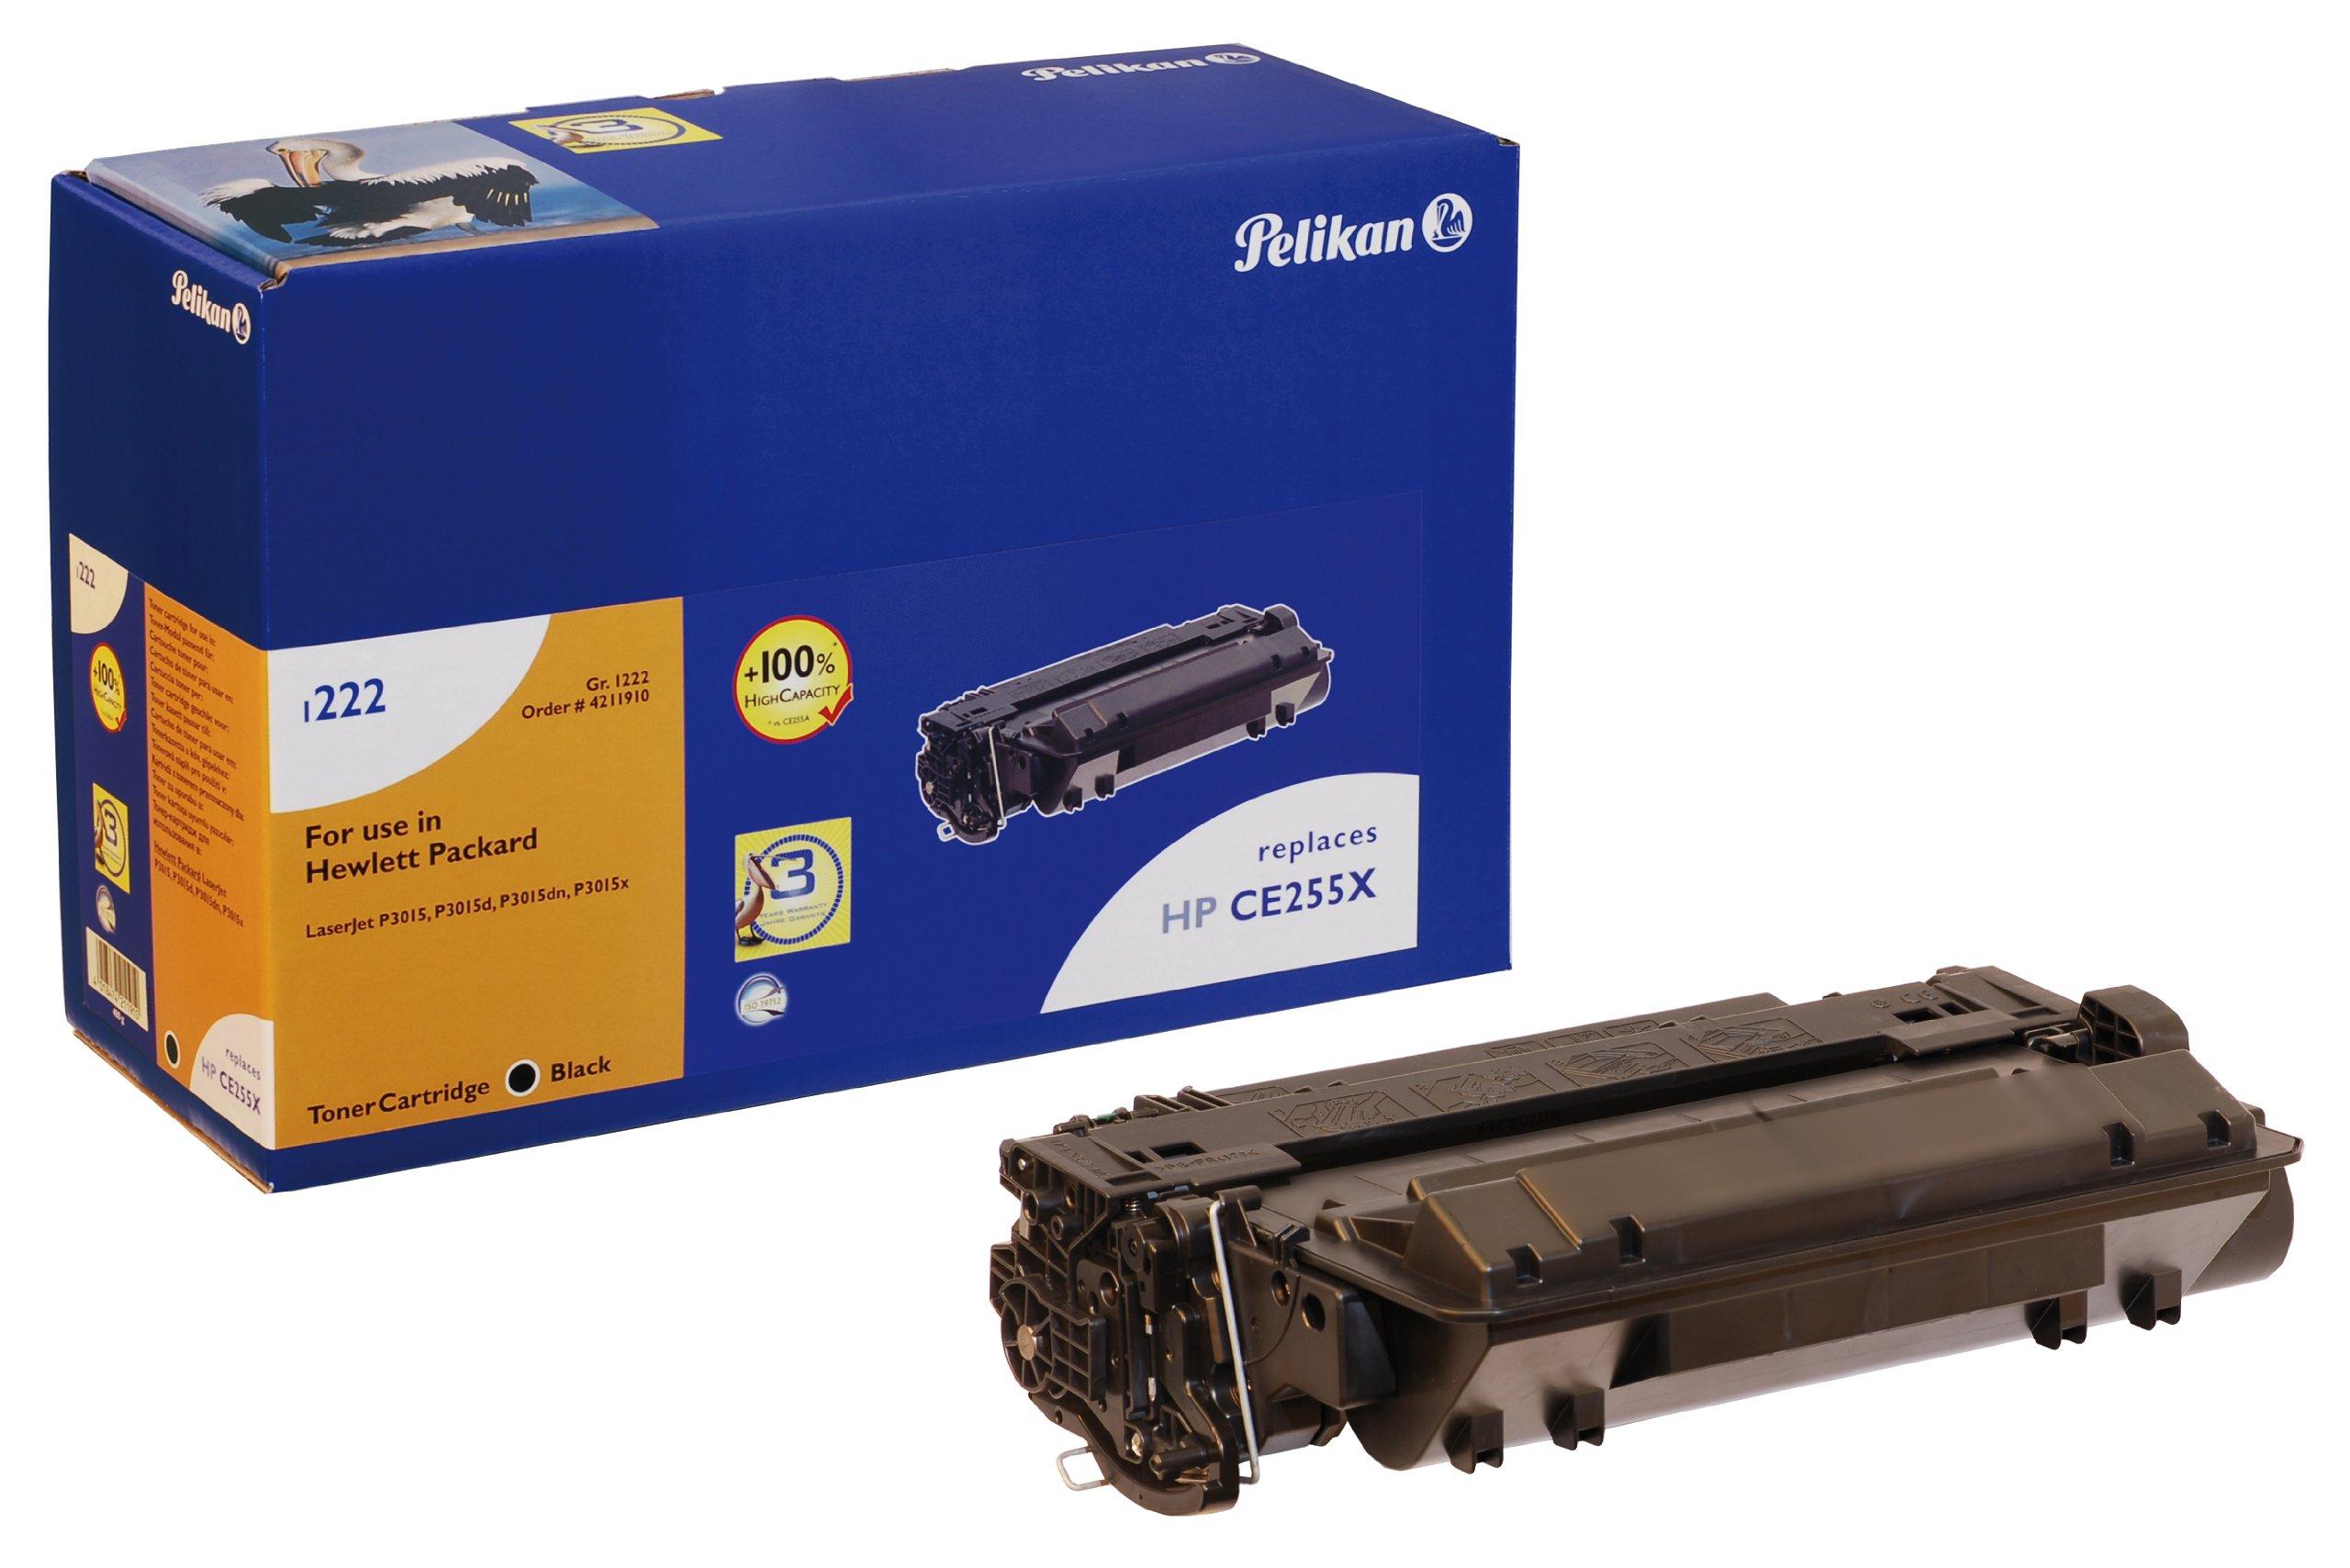 Pelikan-Toner-Modul-1222-ersetzt-HP-CE255A-Schwarz-7300-Seiten